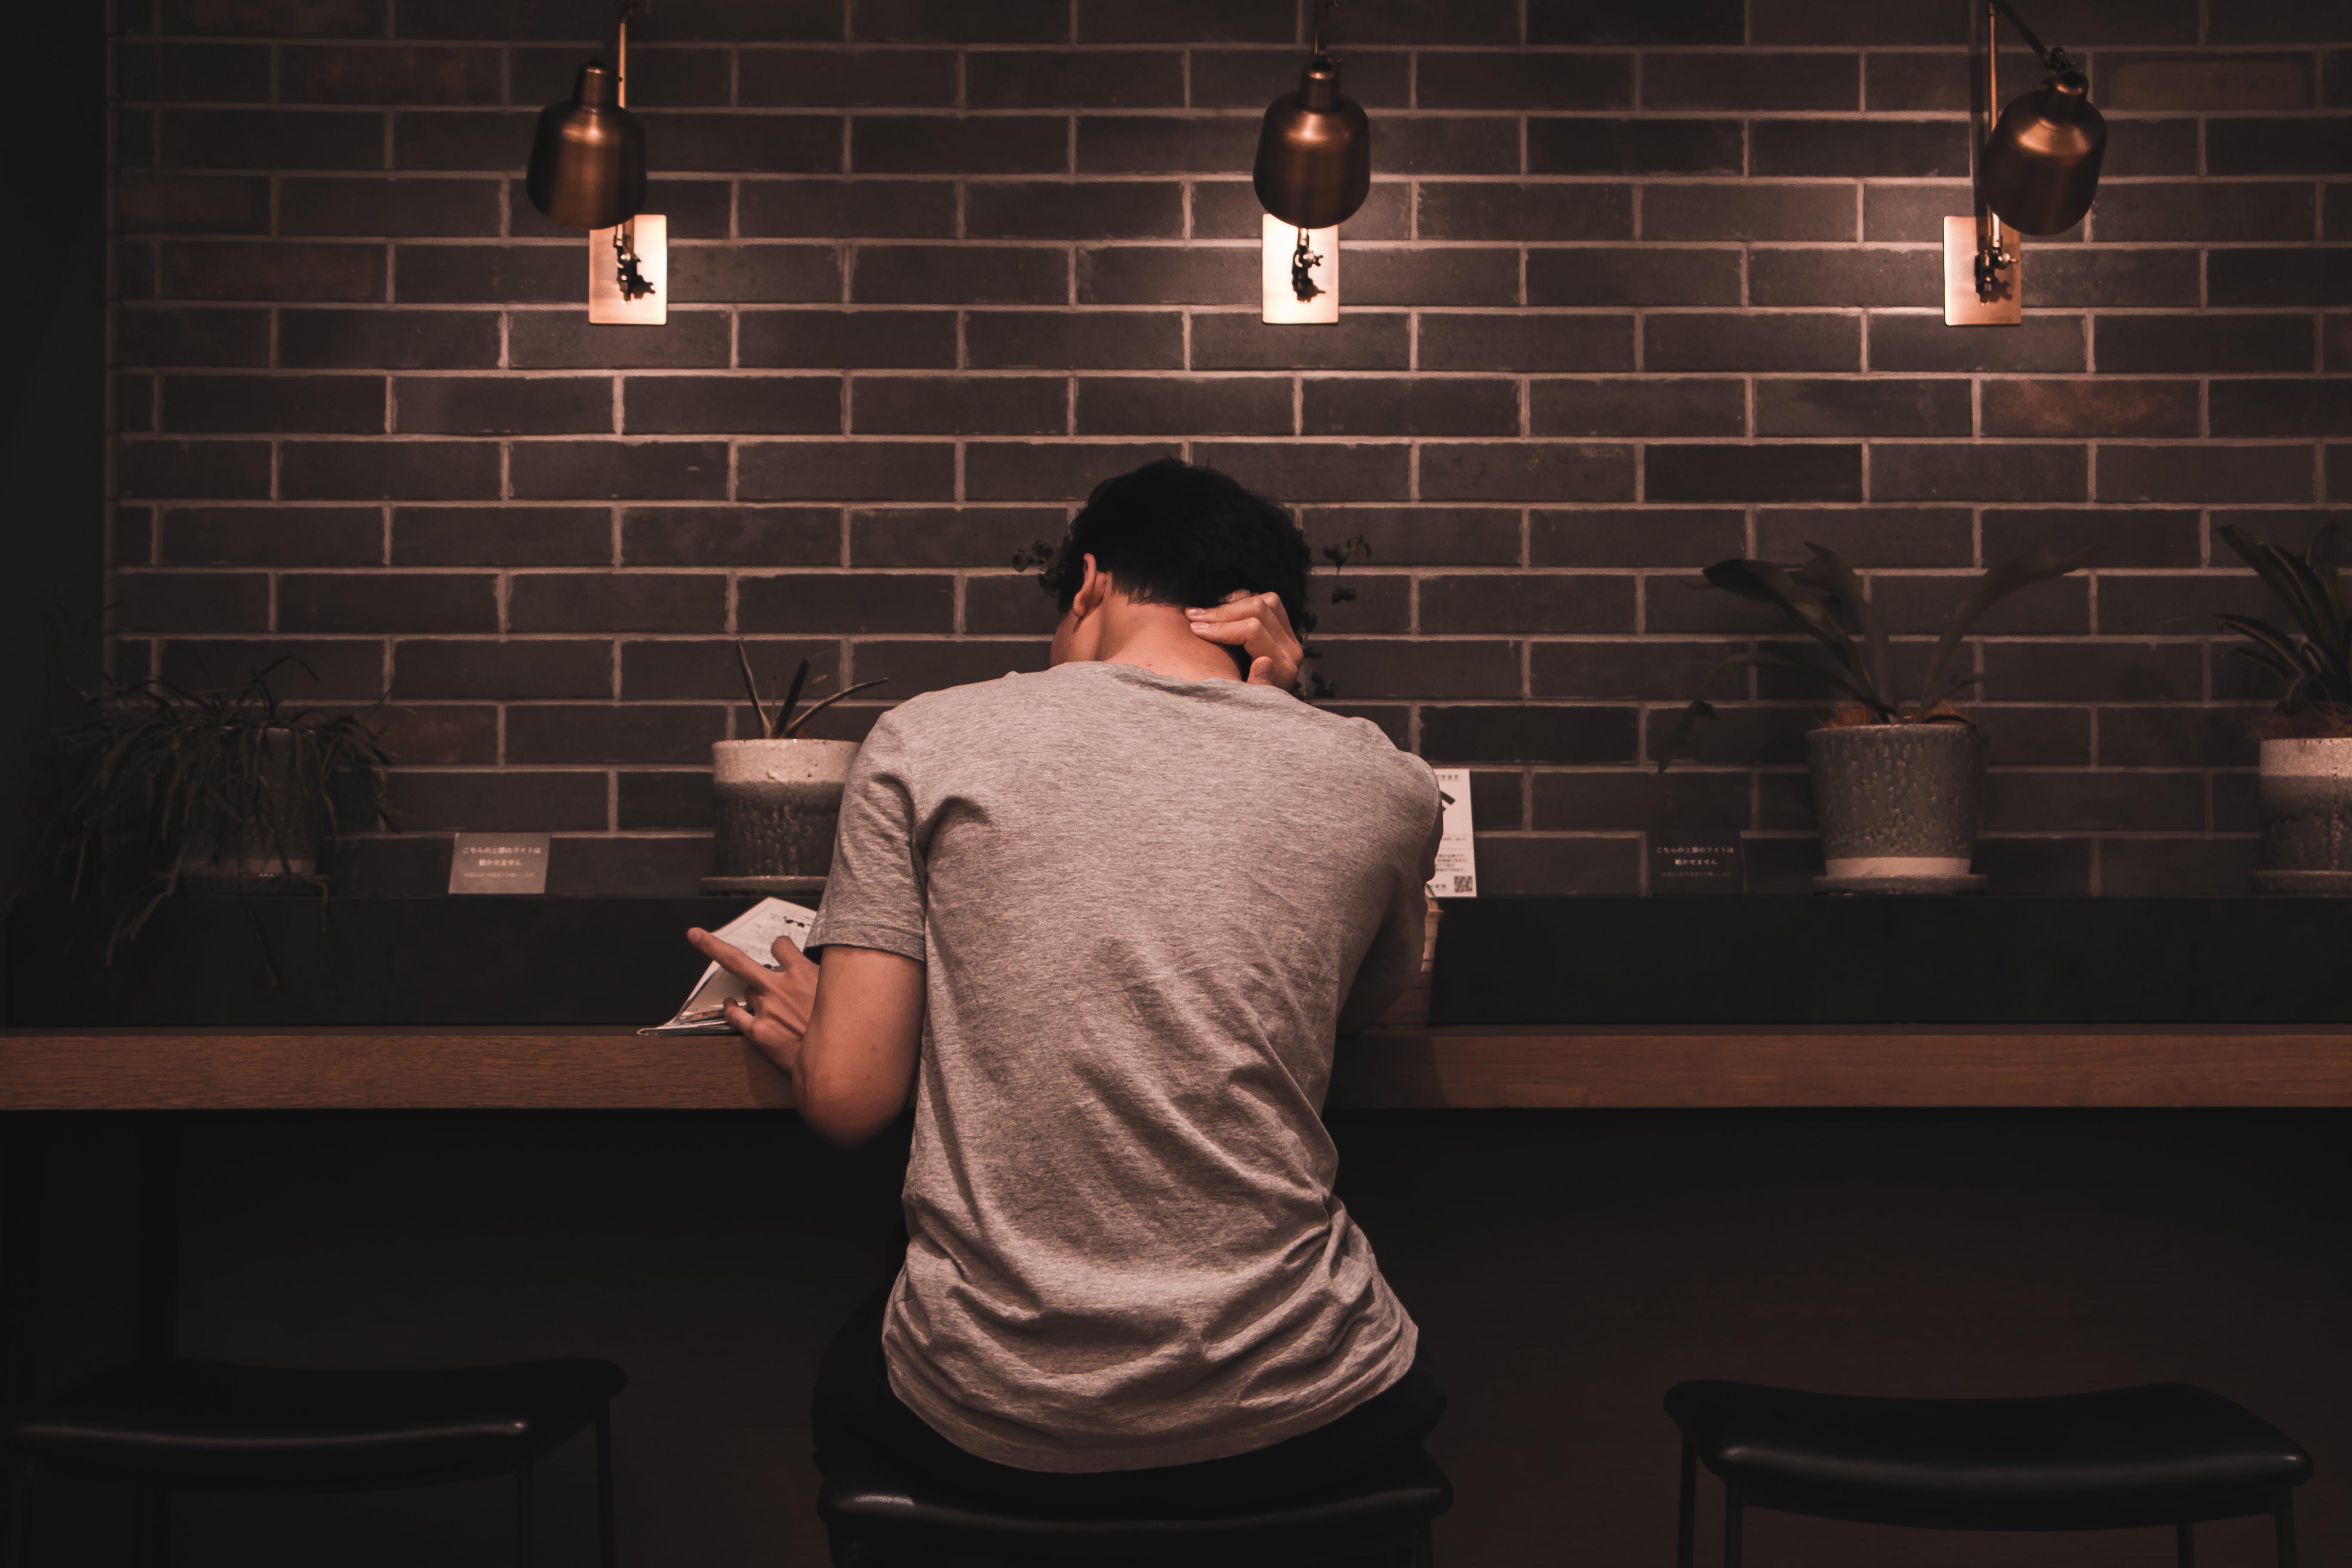 Man Sitting Reading Book